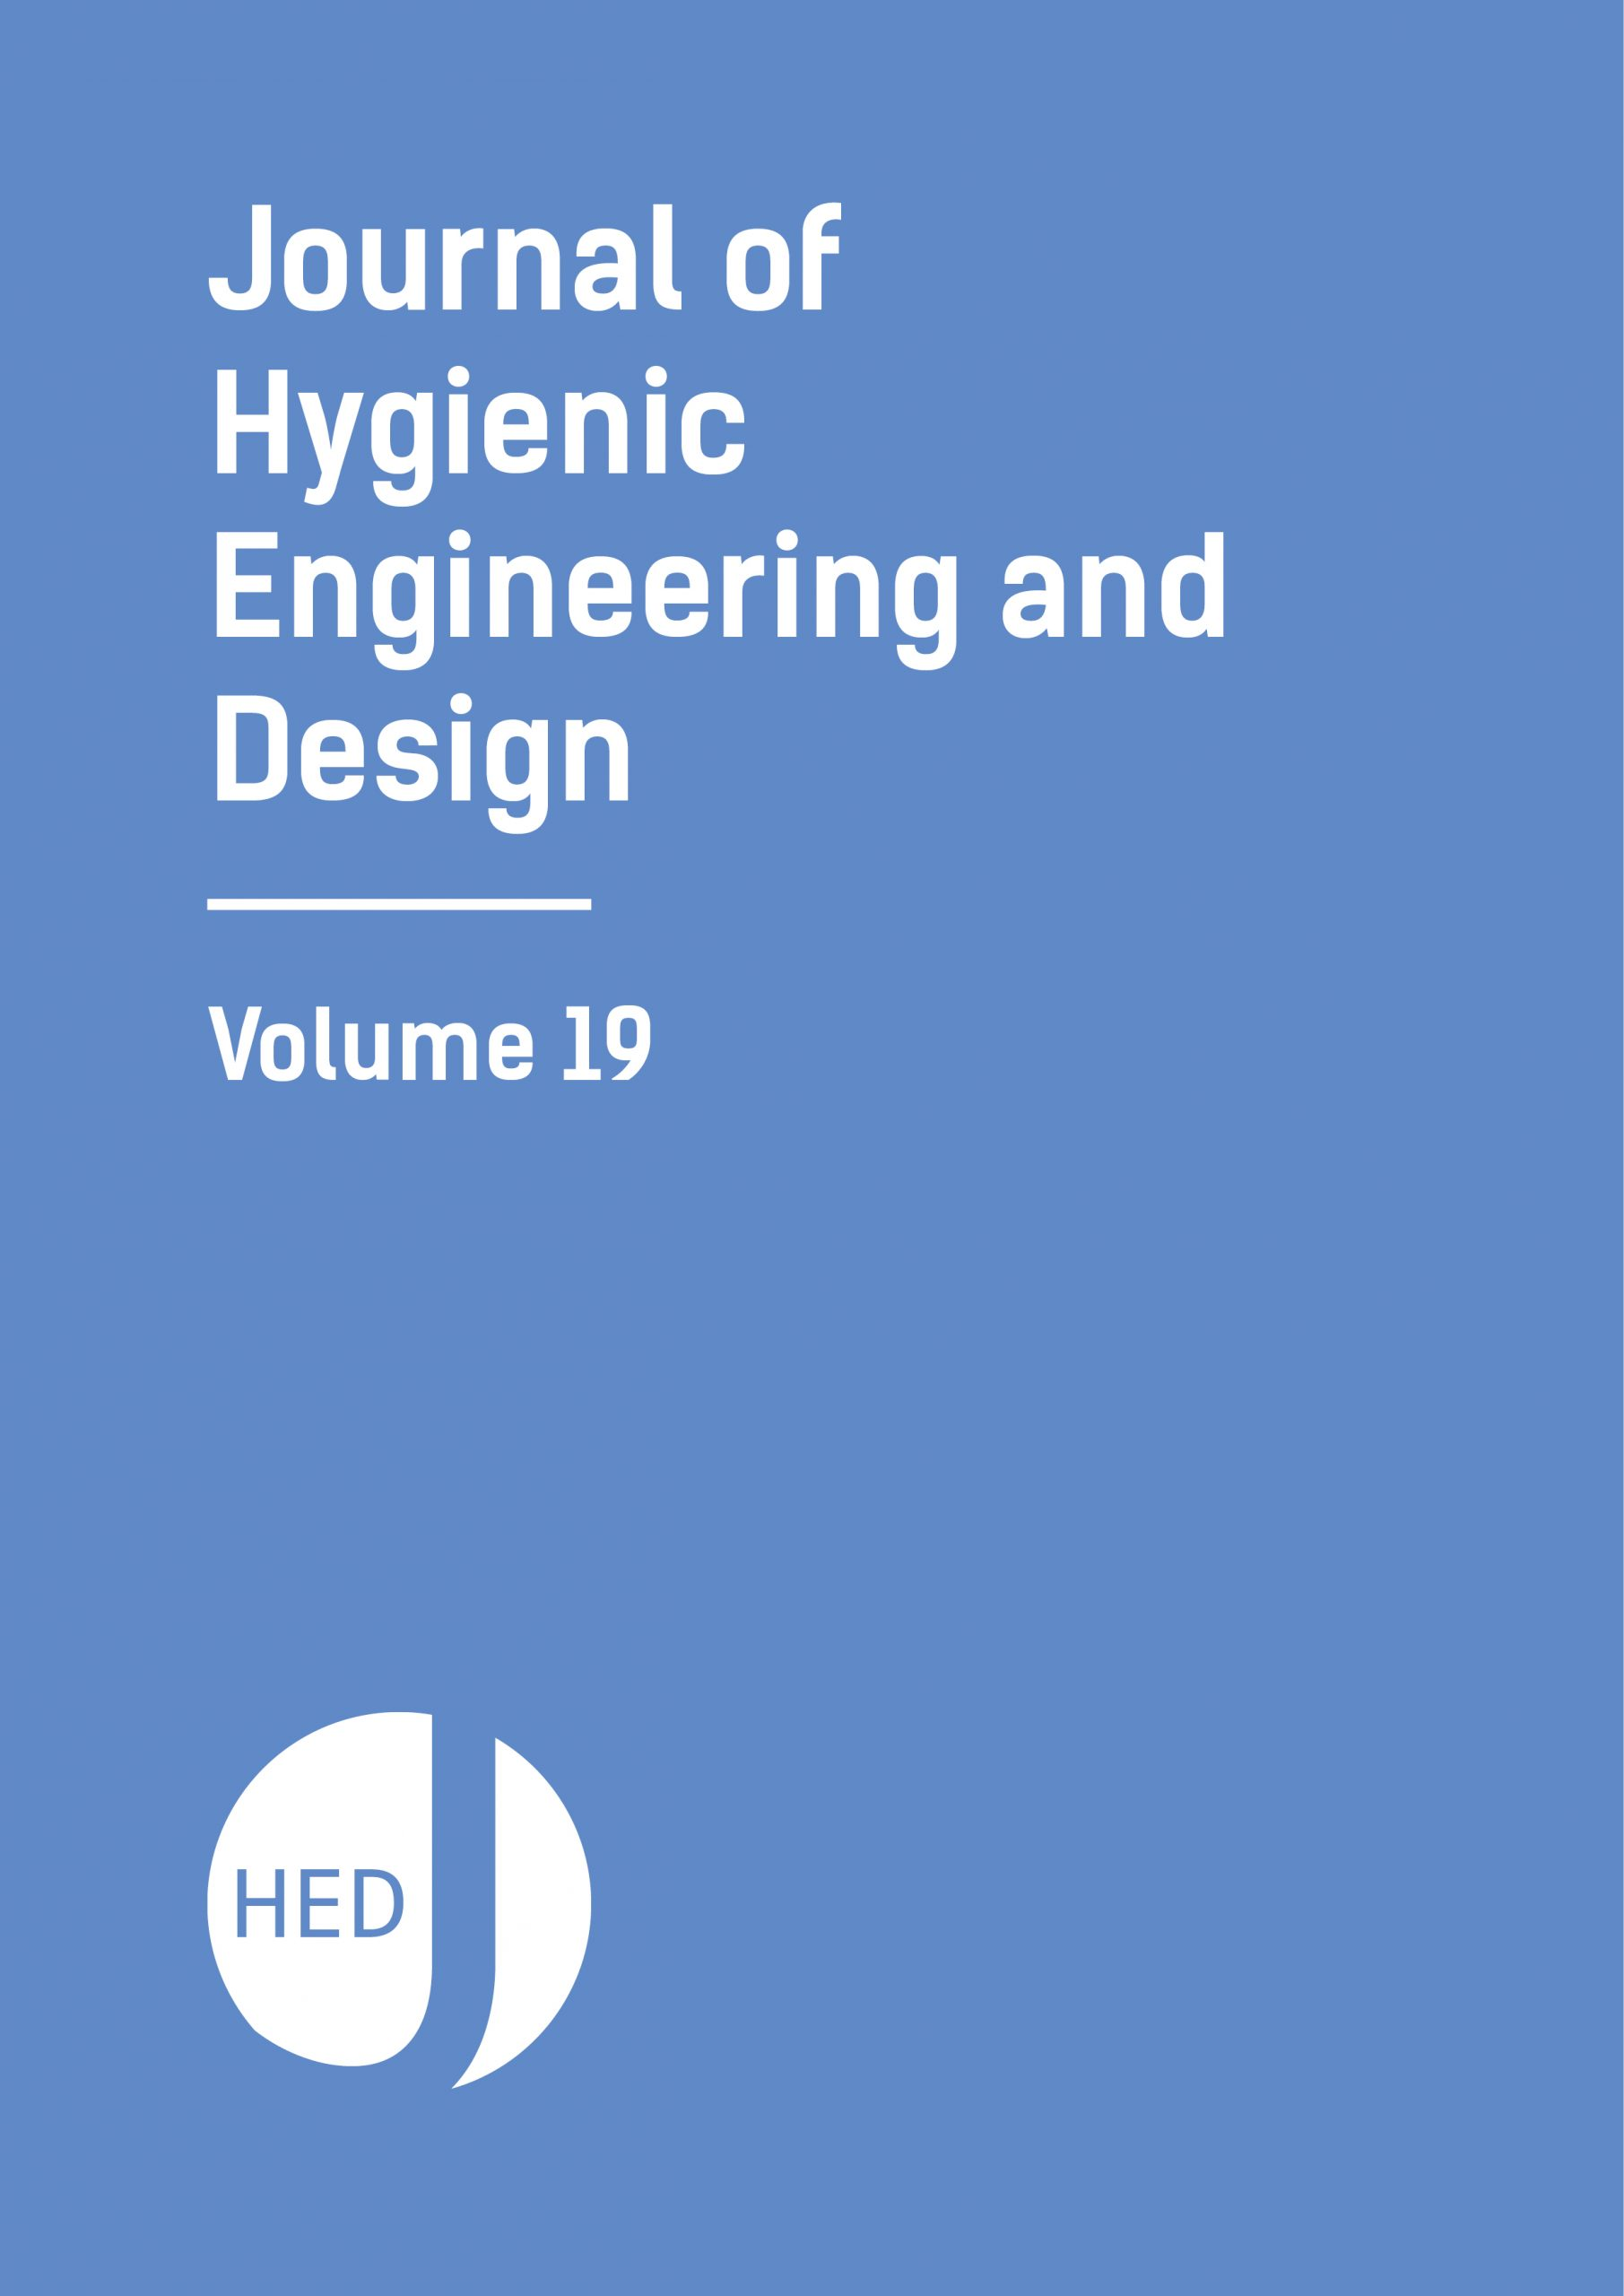 JHED Volume 19